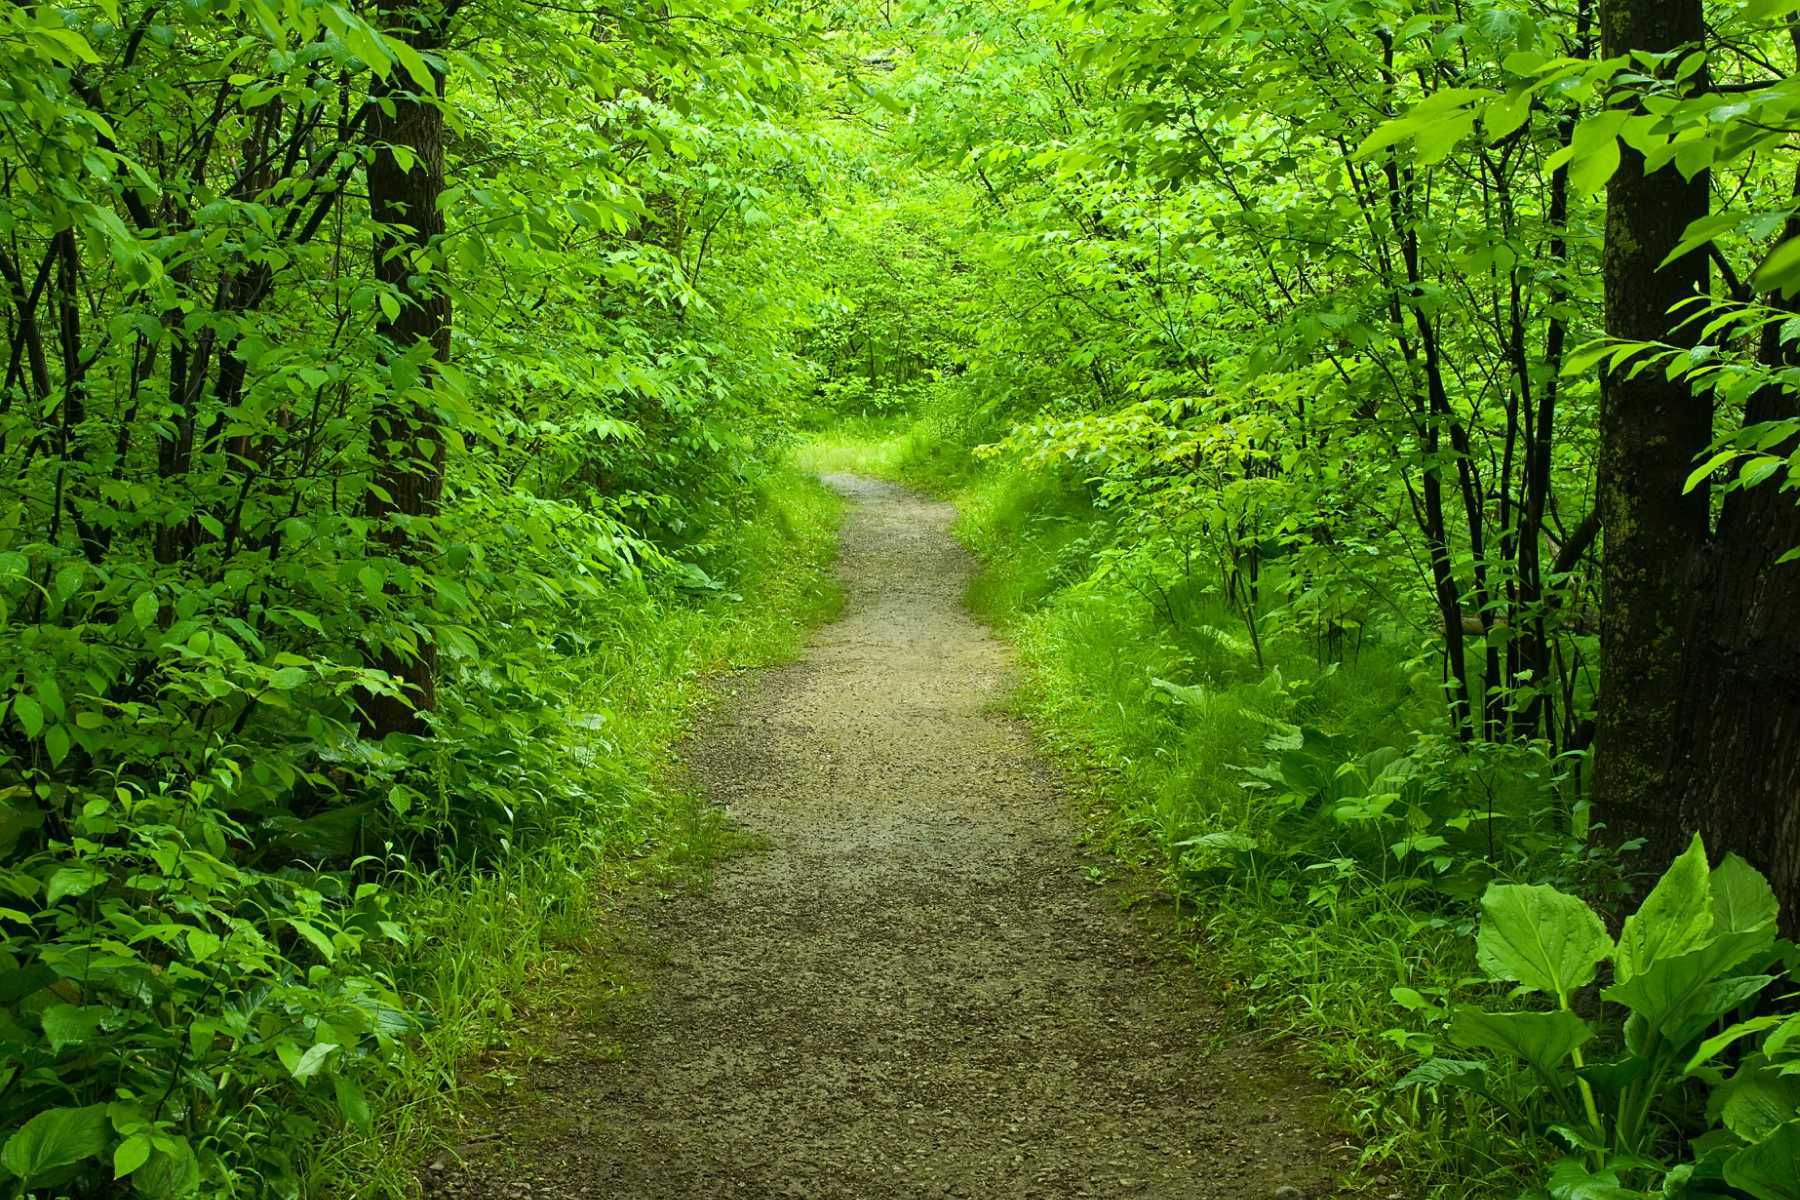 nature path forest walking healer healing service call suicide landysh depositphotos